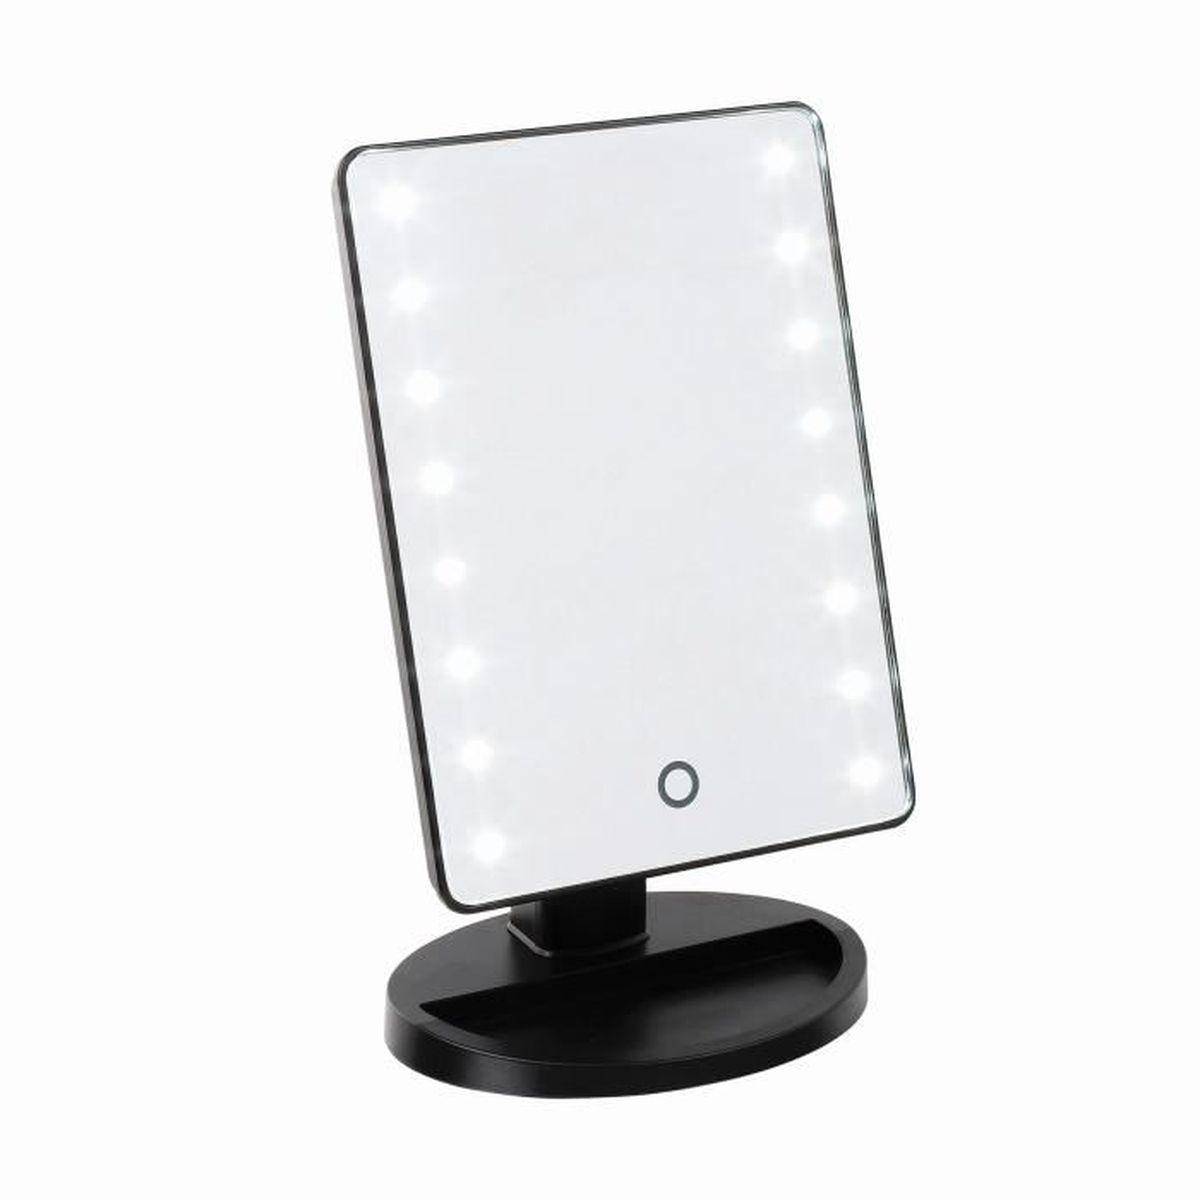 miroir lumineux tactile achat vente miroir cdiscount